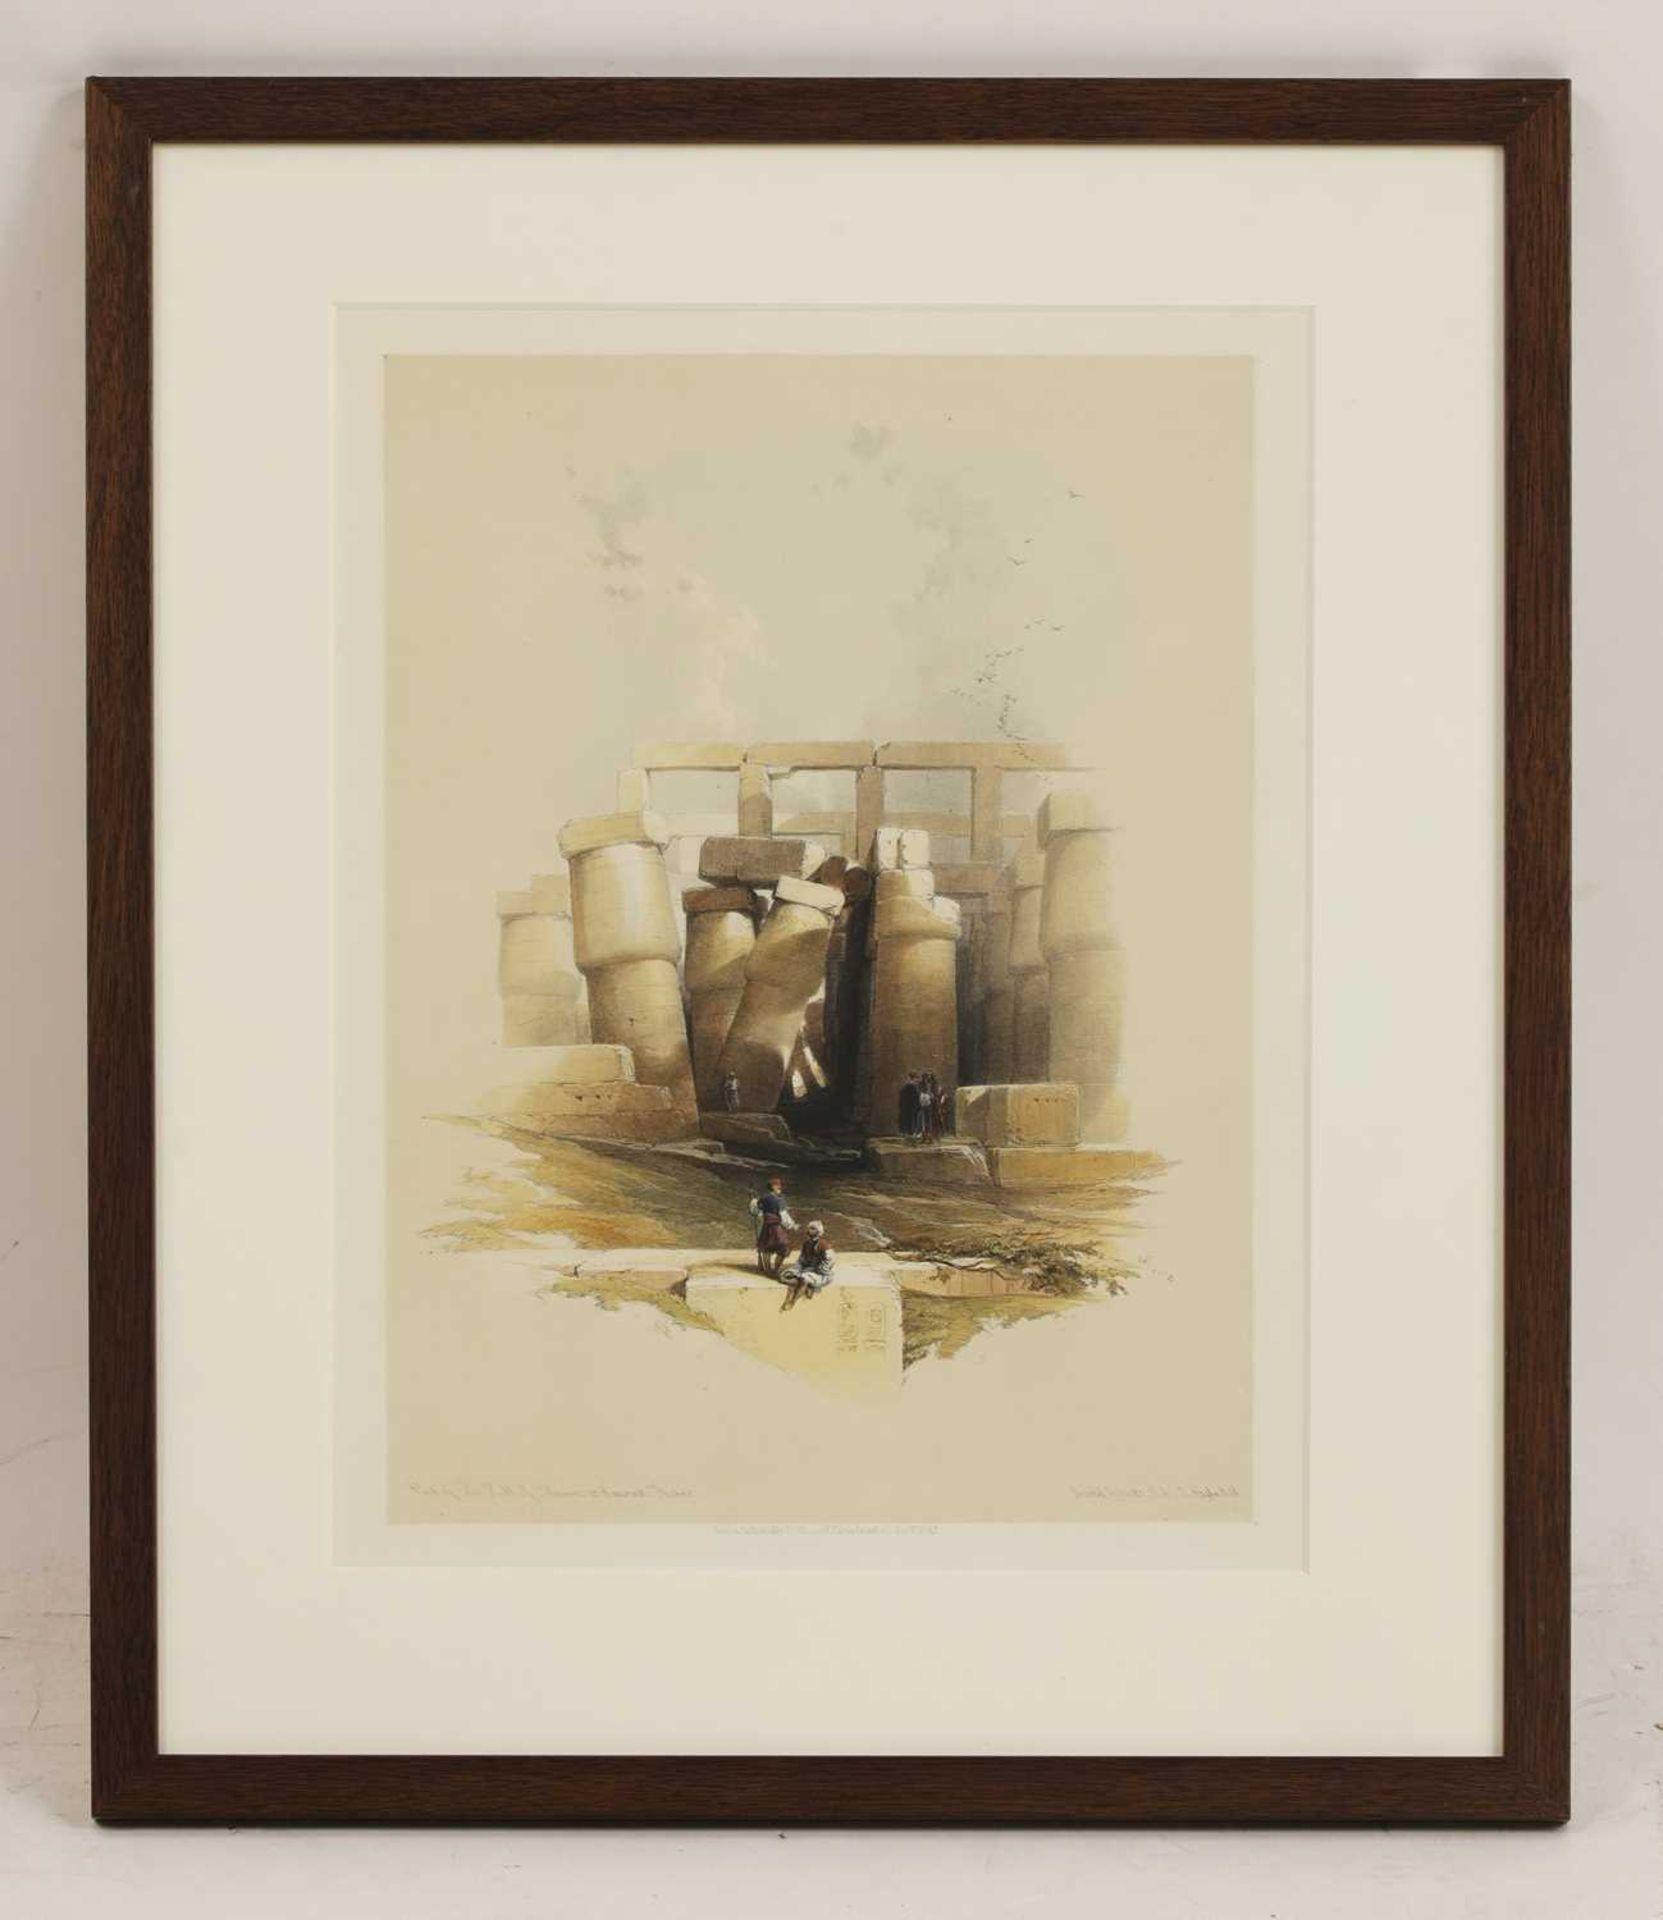 Louis Haghe after David Roberts RA (1796-1864) - Image 10 of 20